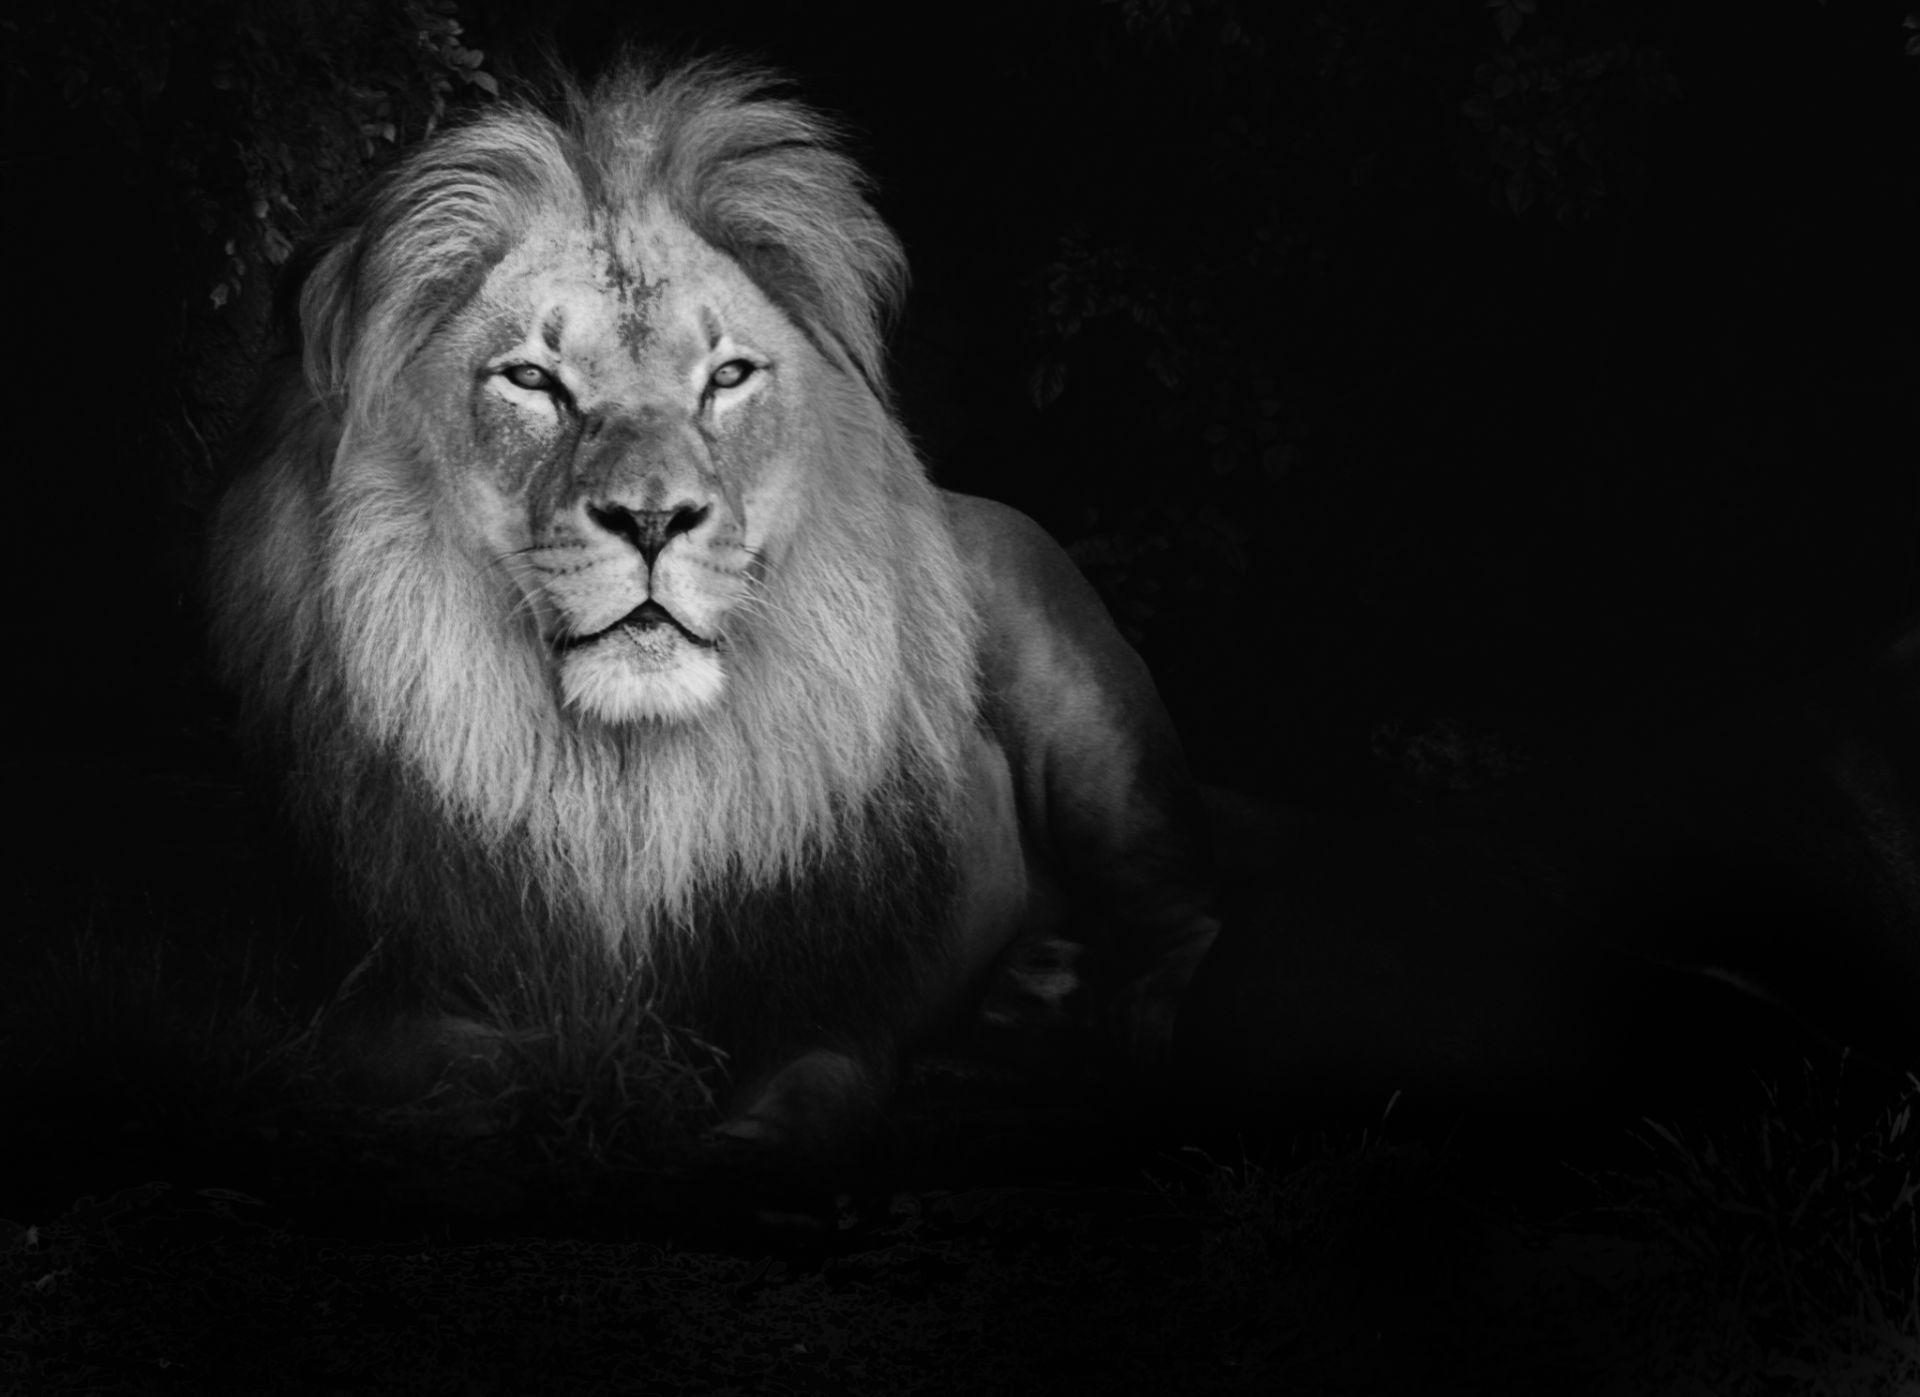 Lion Black And White Animal full hd 1080p wallpaper